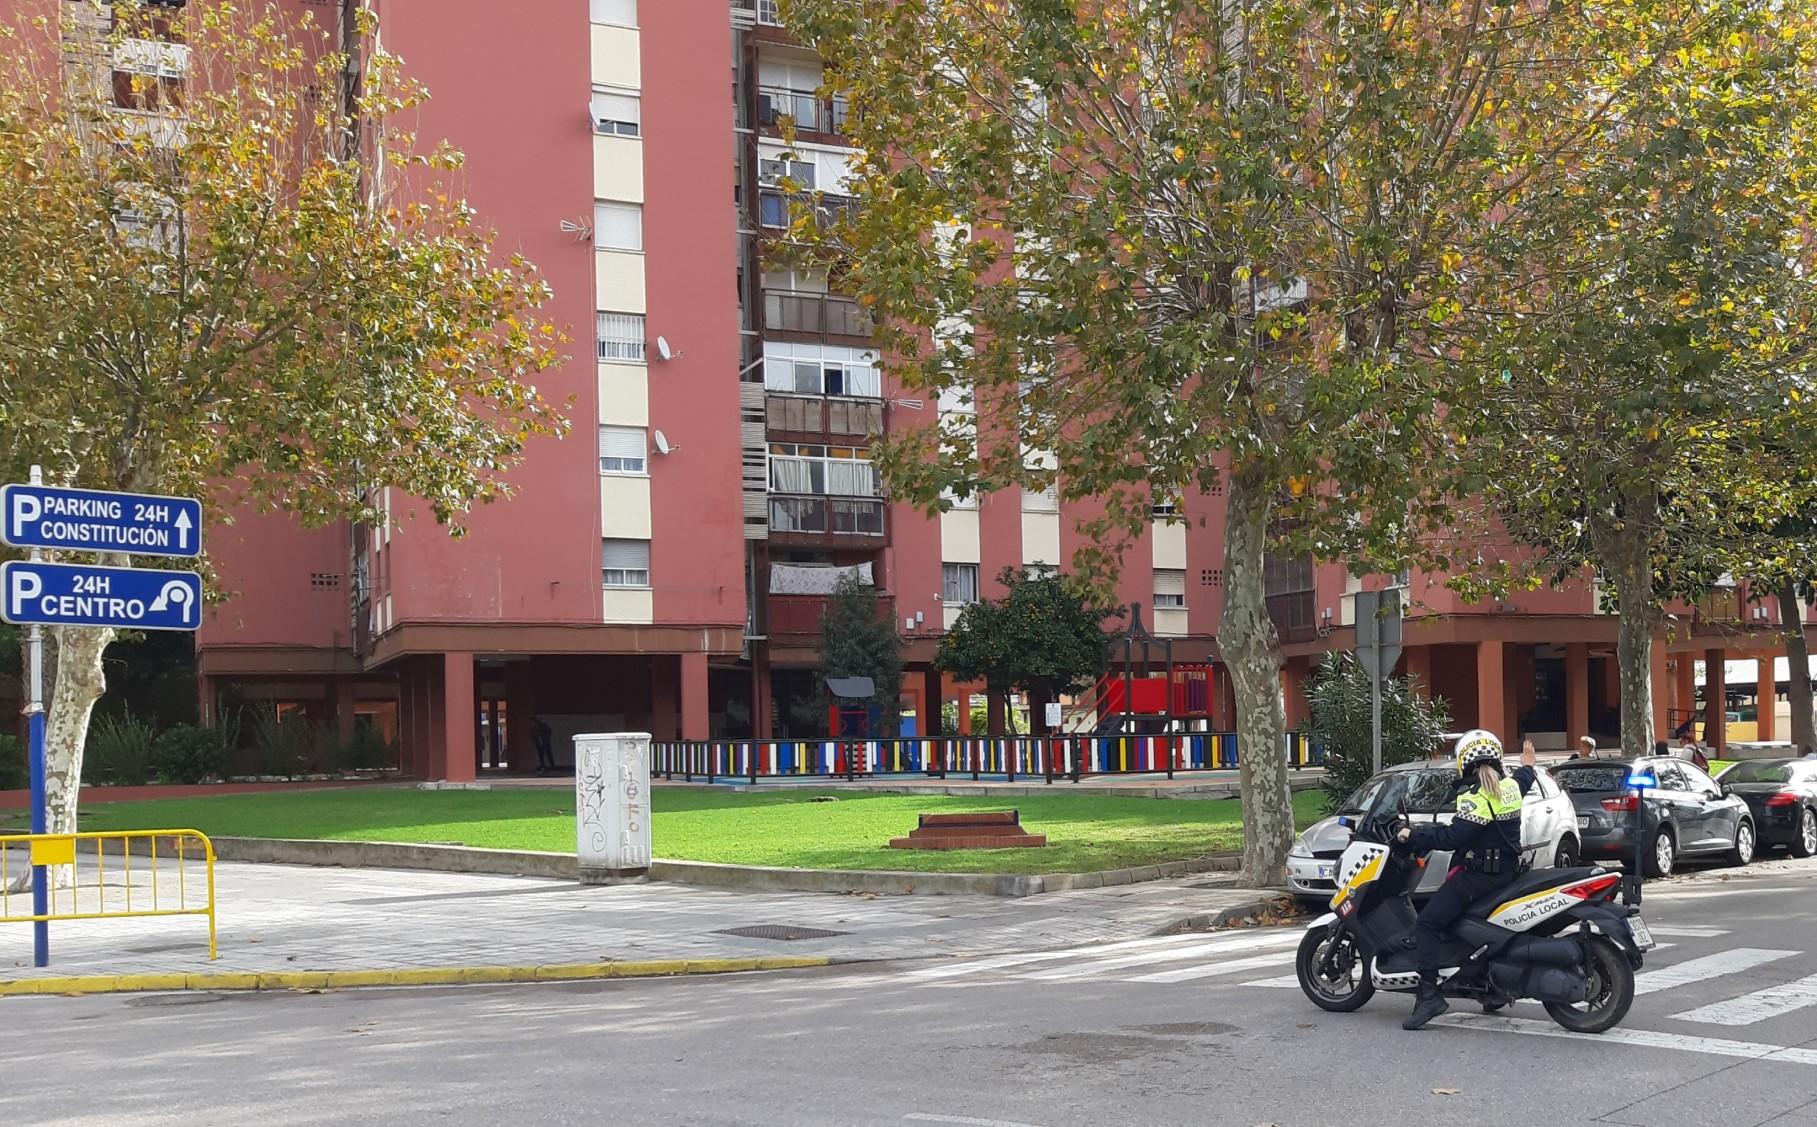 Moto policia Sacra